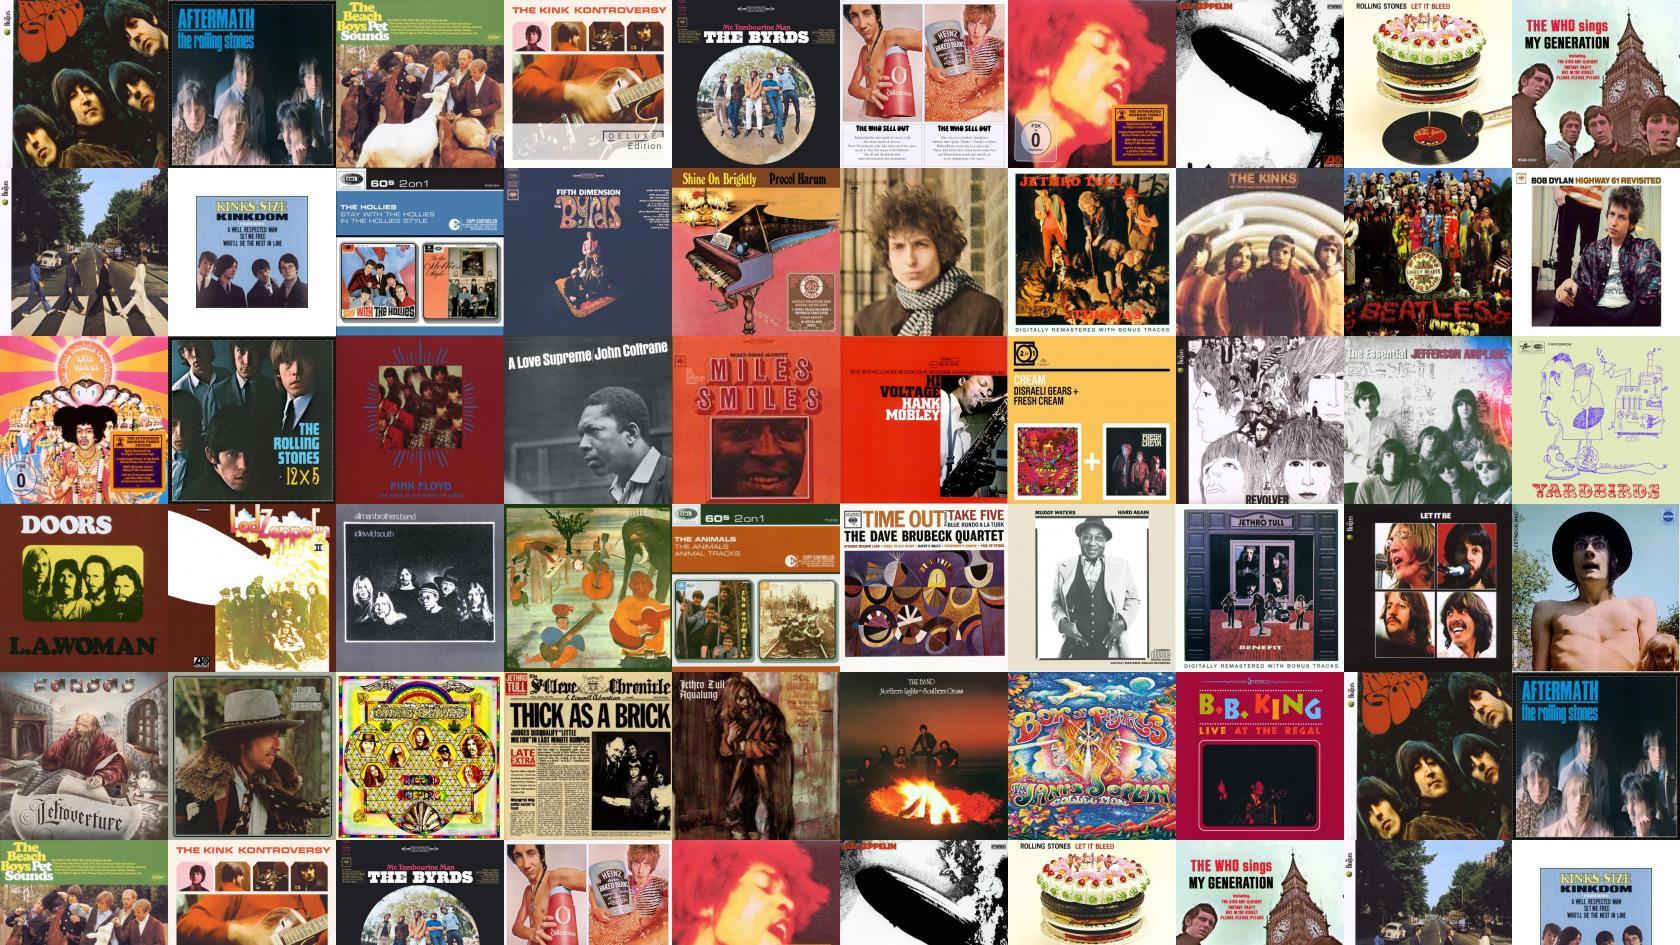 Beatles Rubber Soul Rolling Stones Aftermath Beach Boys